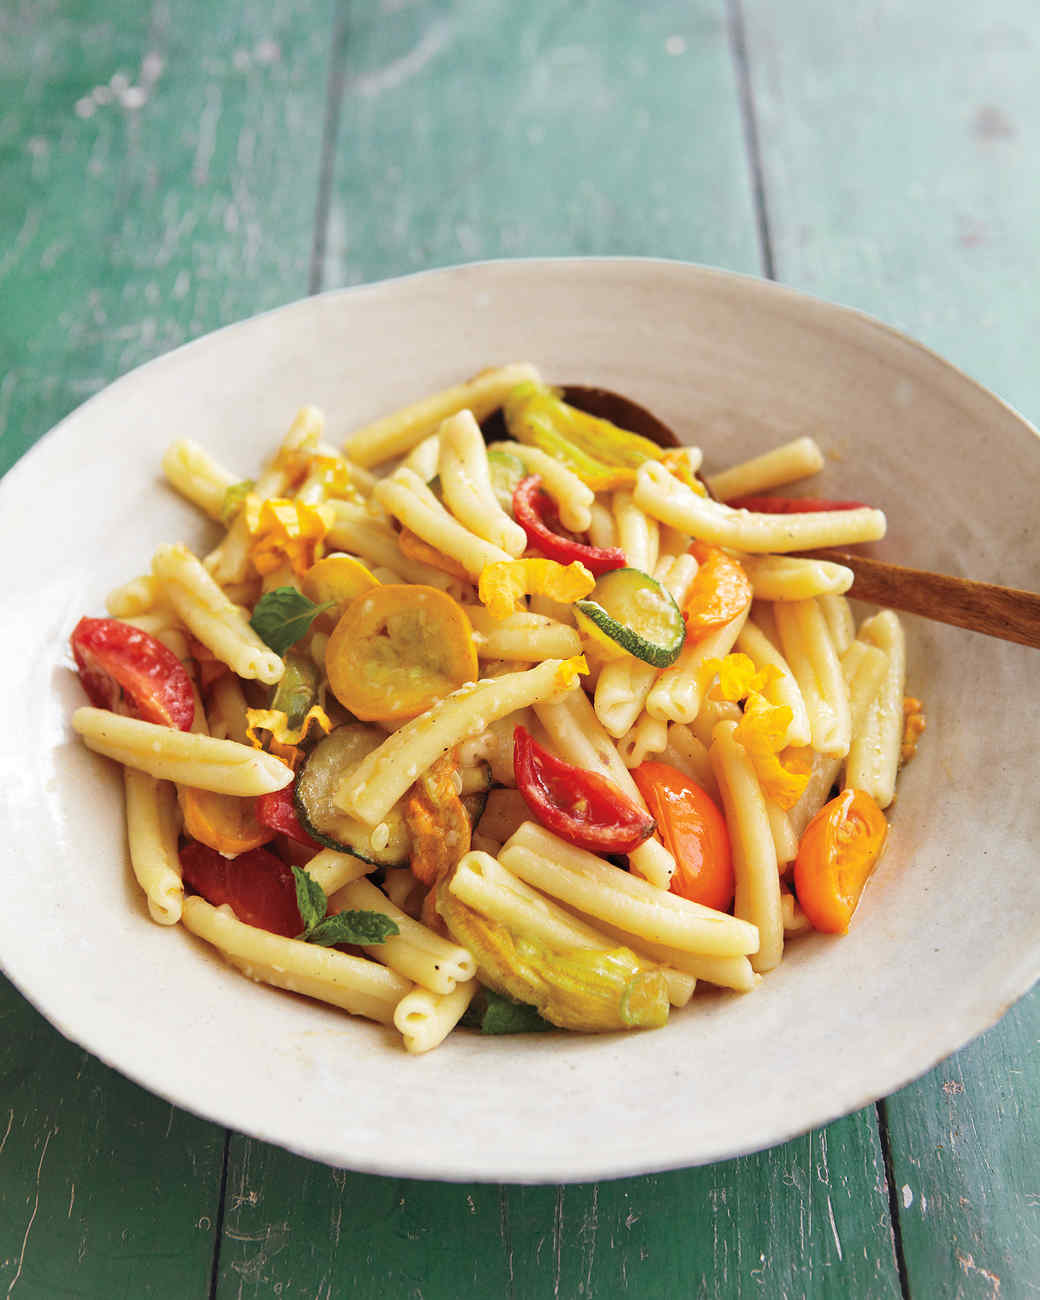 squash-blossoms-pasta-0911mld106586.jpg